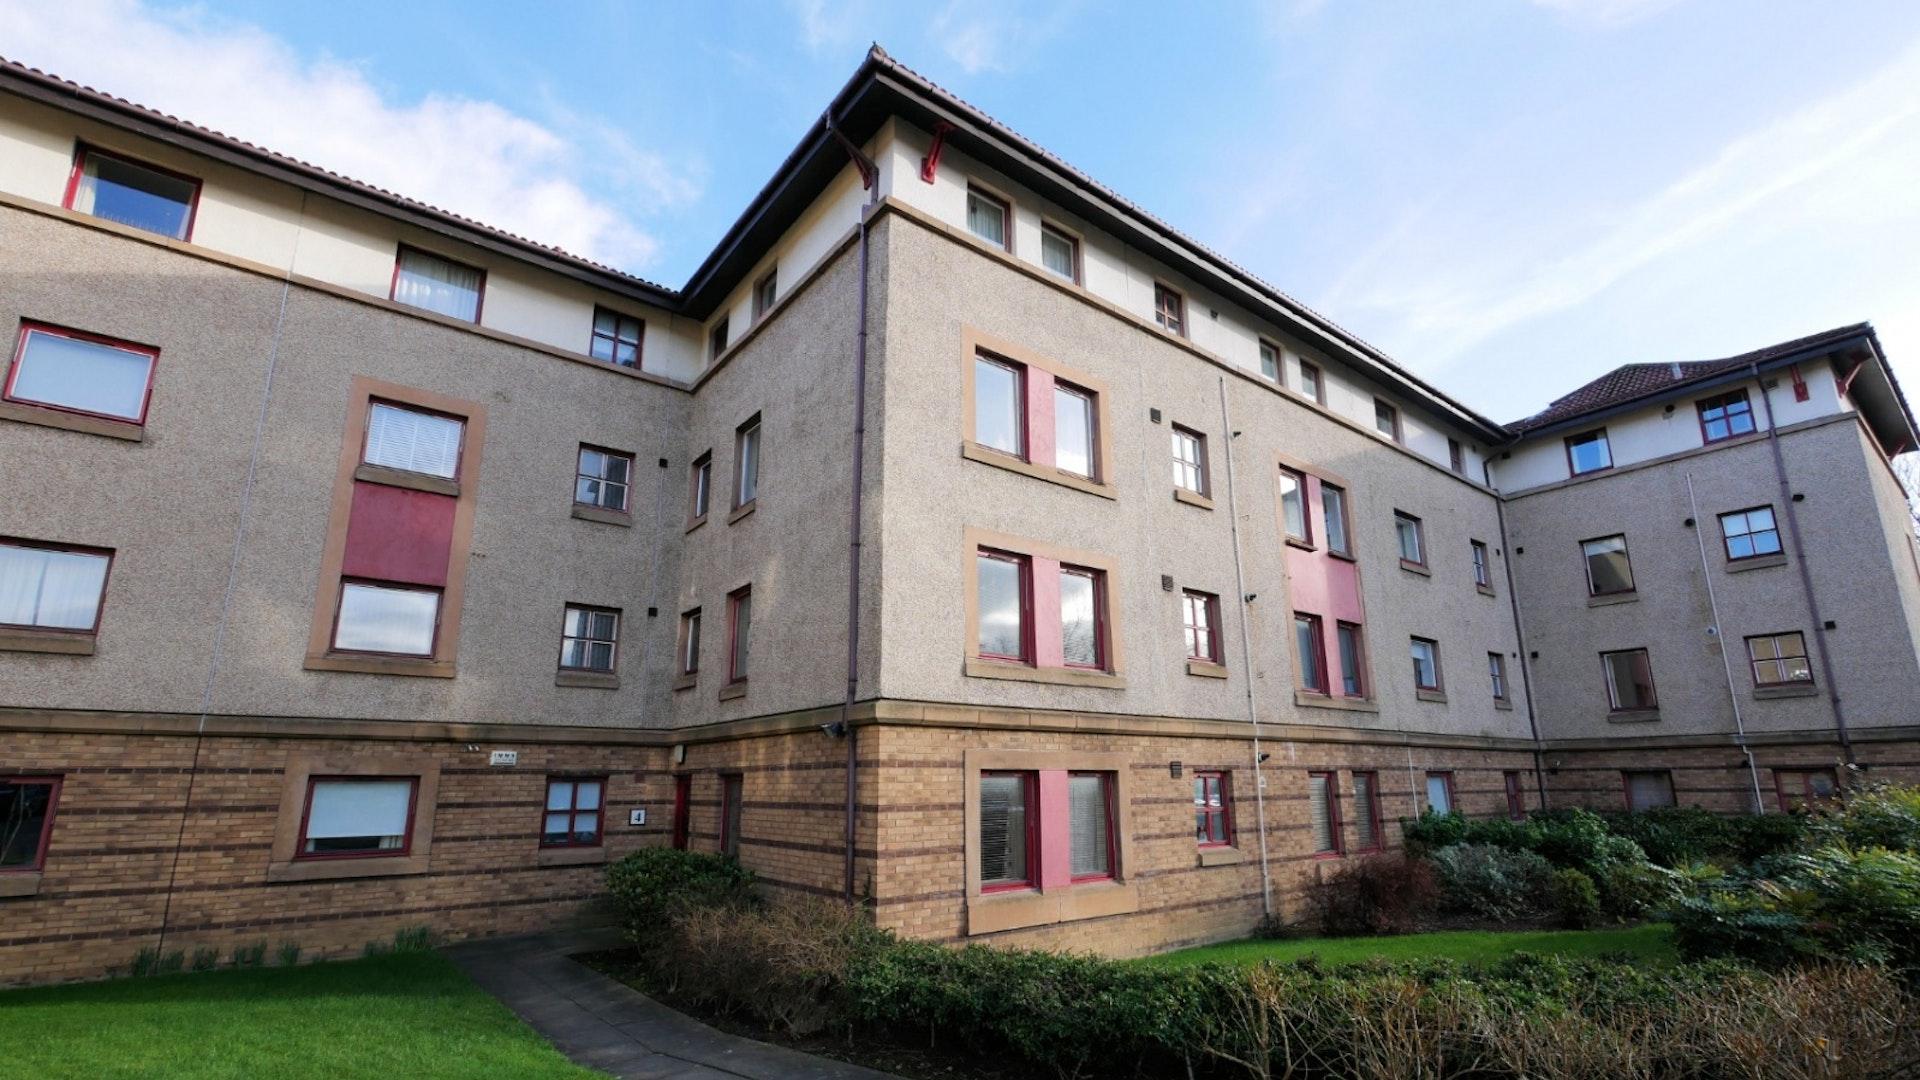 P498: North Werber Place, Fettes, Edinburgh